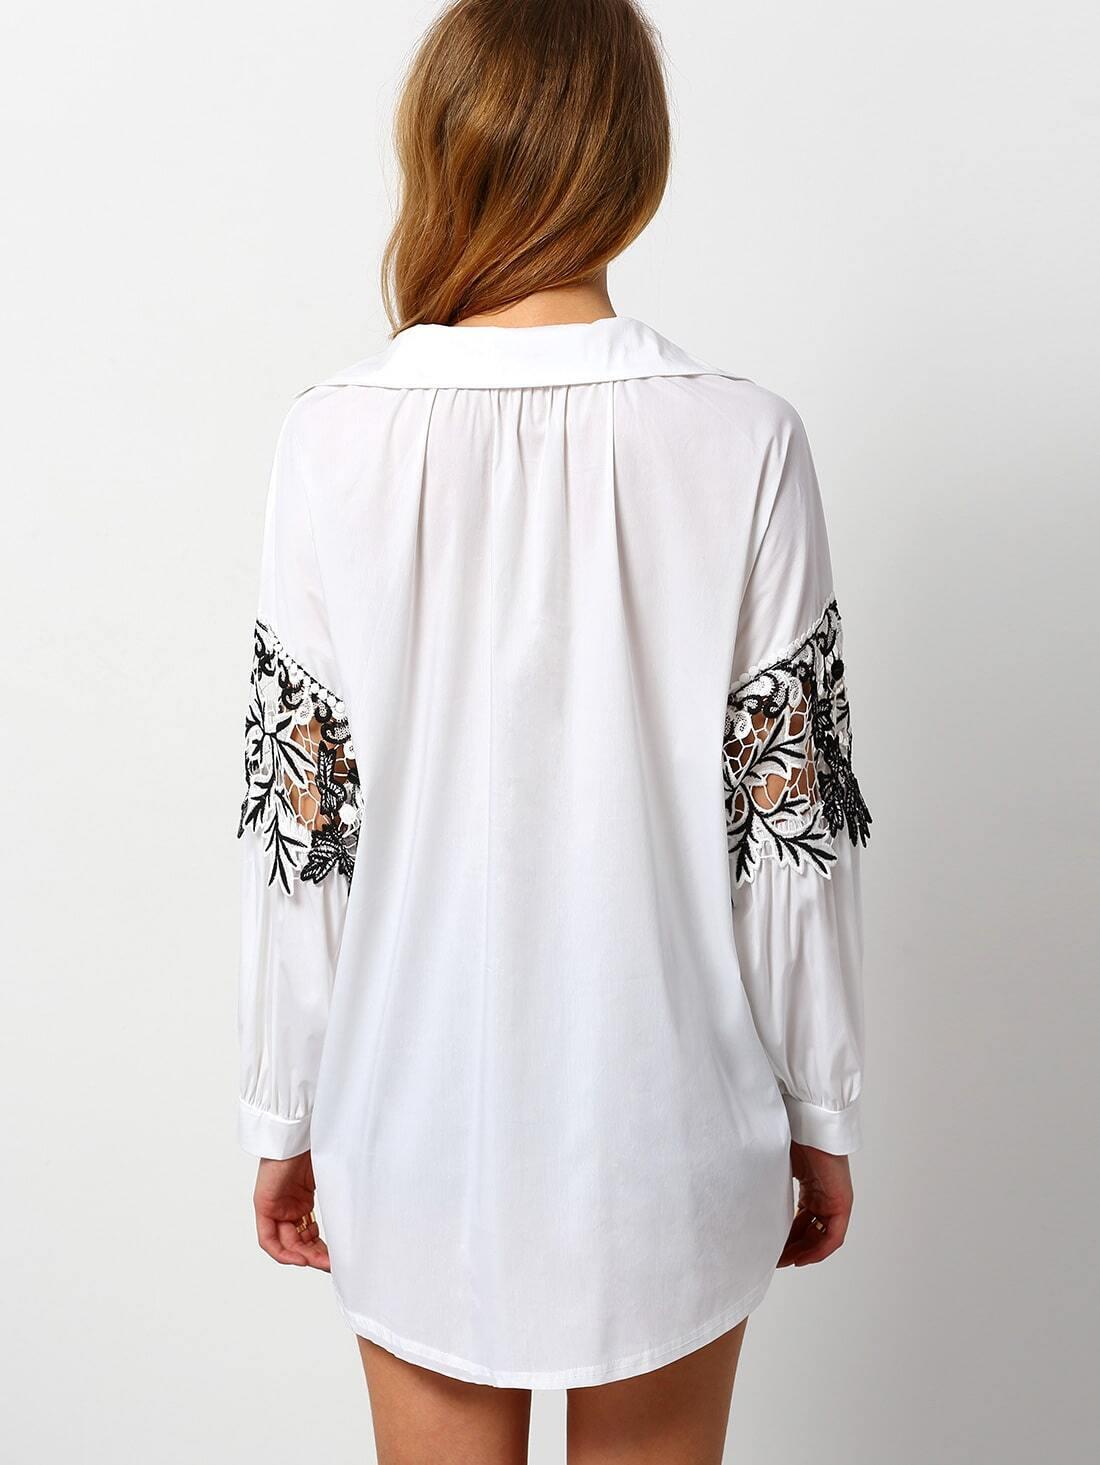 blouse manche longue avec dentelle et crochet blanc french shein sheinside. Black Bedroom Furniture Sets. Home Design Ideas